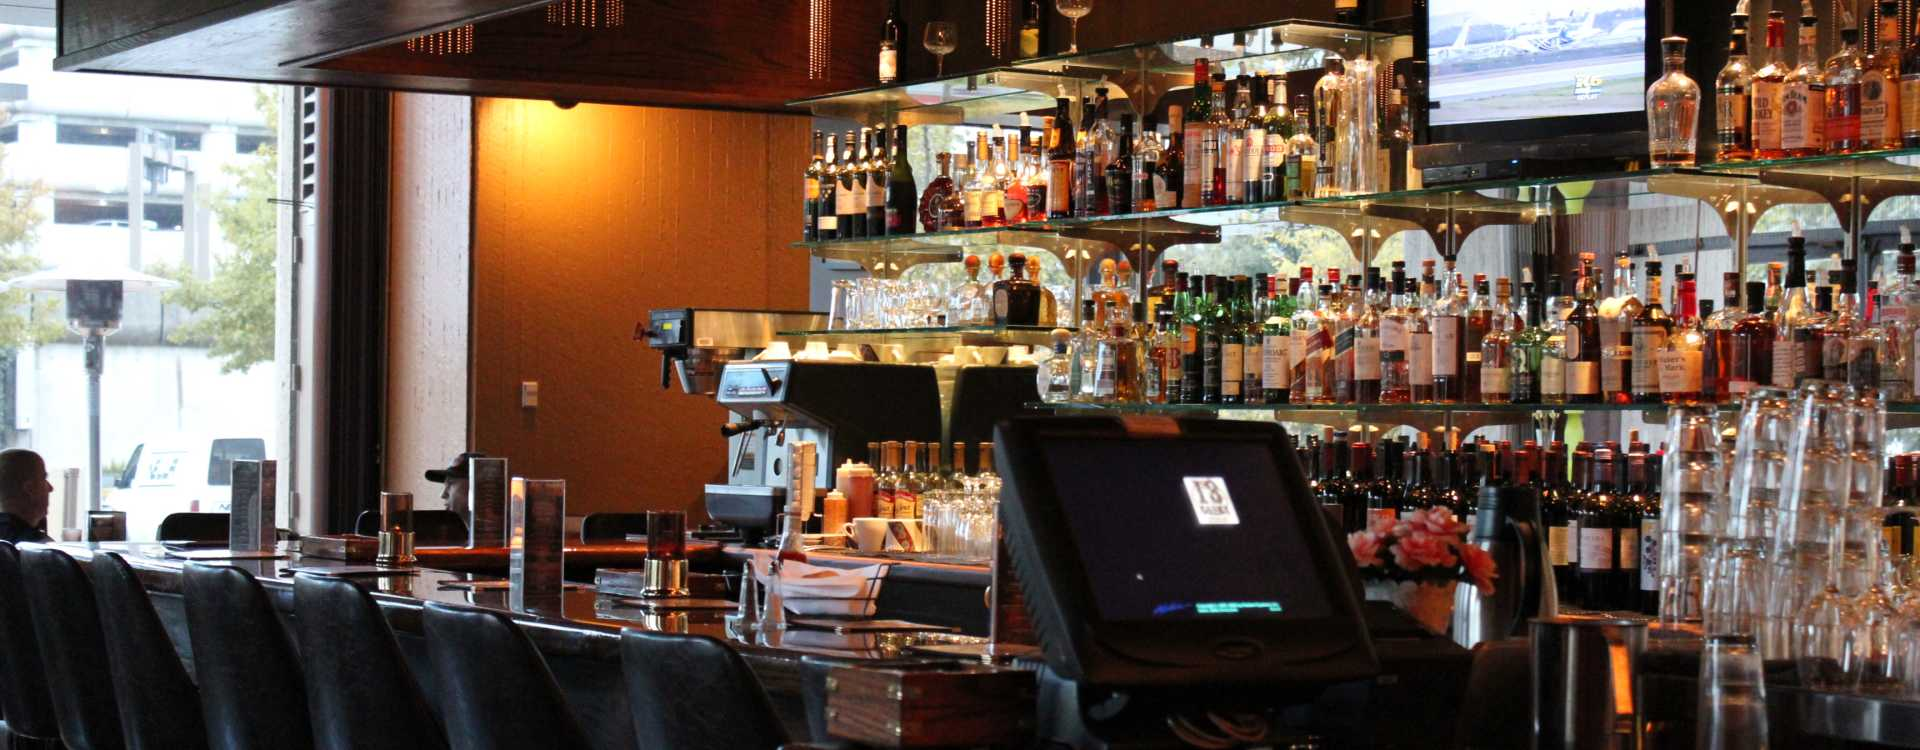 13_Coins_Restaurant-8.JPG